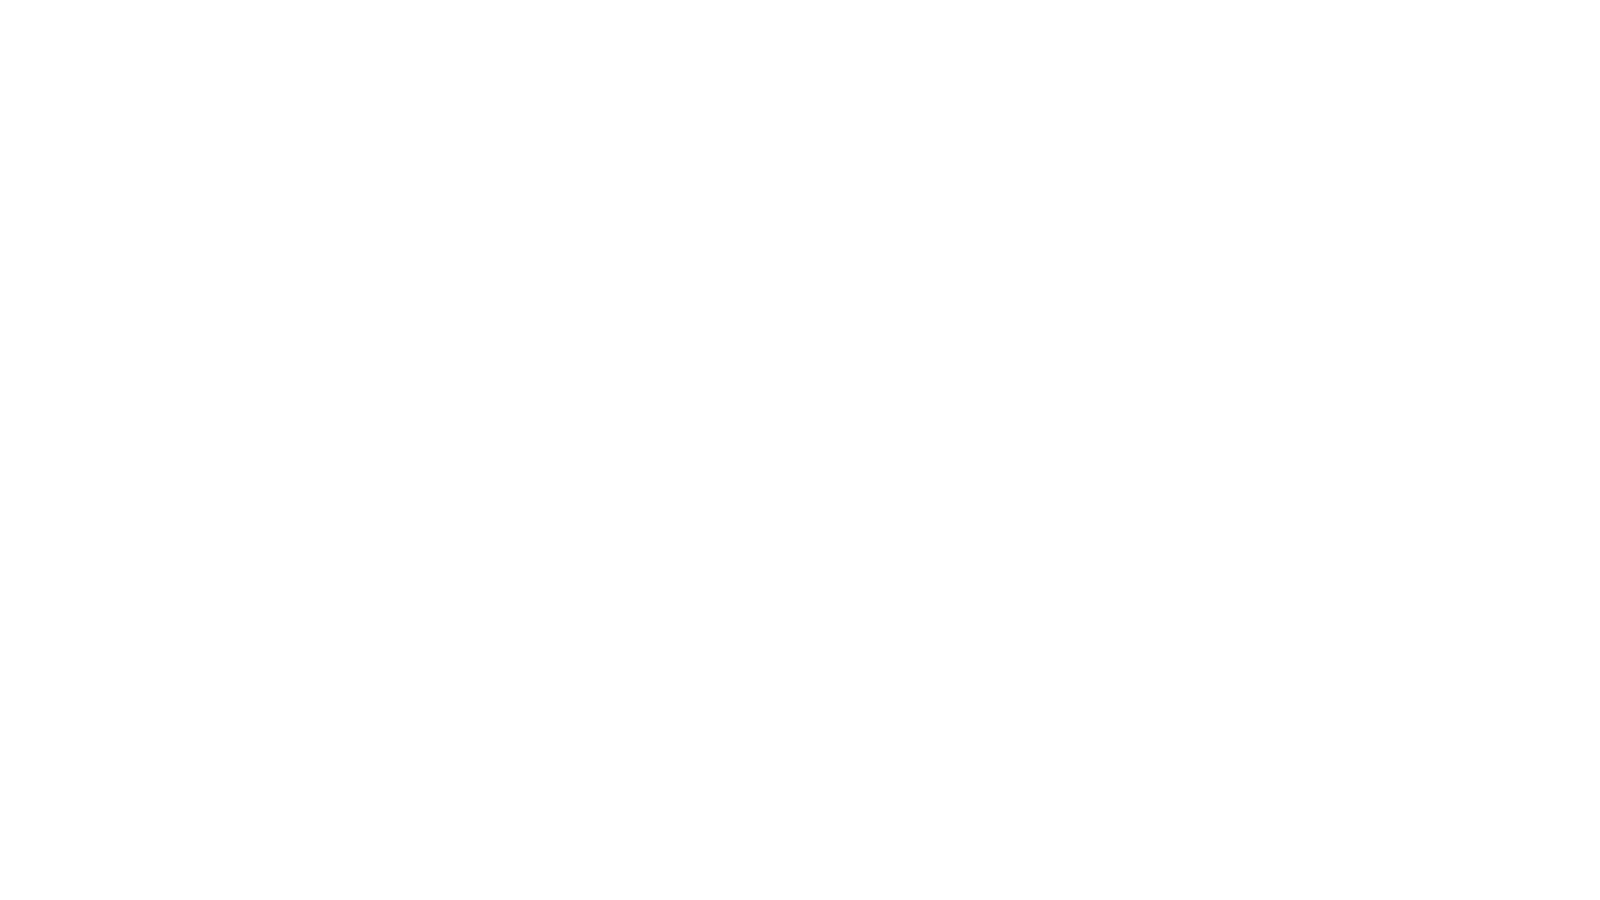 [instagram] https://www.instagram.com/kankokuen_yakiniku/  [Twitter] https://twitter.com/kankokuen_o  [韓国苑 下郡店]  097-569-6434 [韓国苑 臼杵店]  0972-64-0003 [韓国苑 都町店]  097-500-7770 [韓国苑 別府店]  0977-76-7008 [韓国苑 庄内店]  097-586-2226 [韓国苑 宗方店]  道路拡張のため移転休業中 [韓国苑 三重店]  0974-24-0588 [韓国苑 中津宮島店]  0979-22-0111 [韓国苑 中津沖代店]  0979-64-8822  《効果音》 Oto logic Music is VFR 《効果音》 Youtube music libraly  #韓国苑 #焼肉 #おおいた和牛